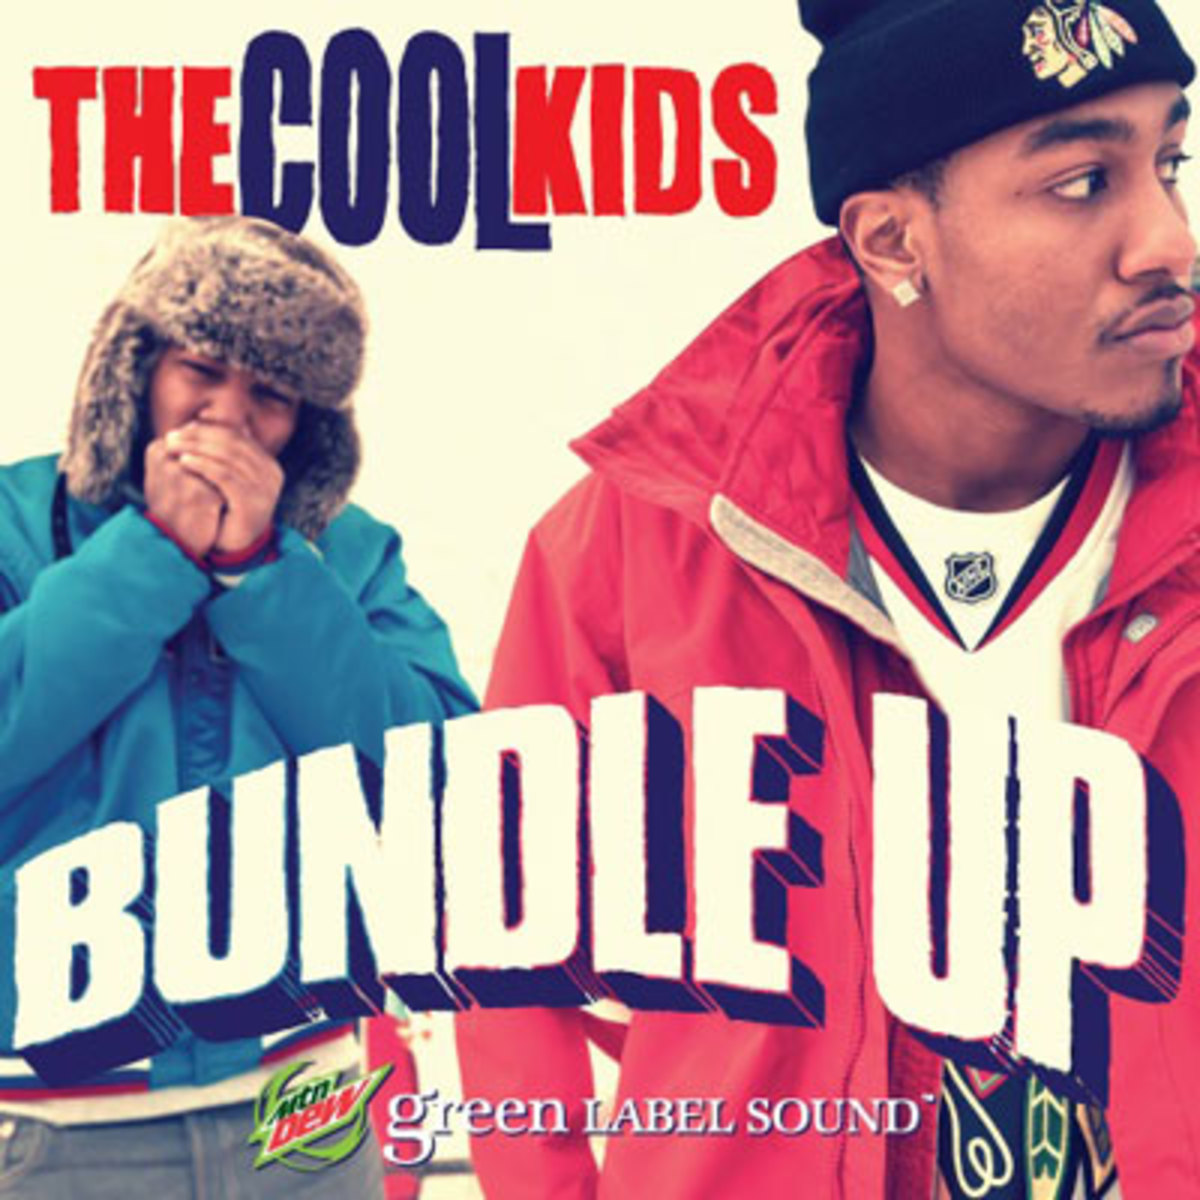 thecoolkids-bundleup.jpg